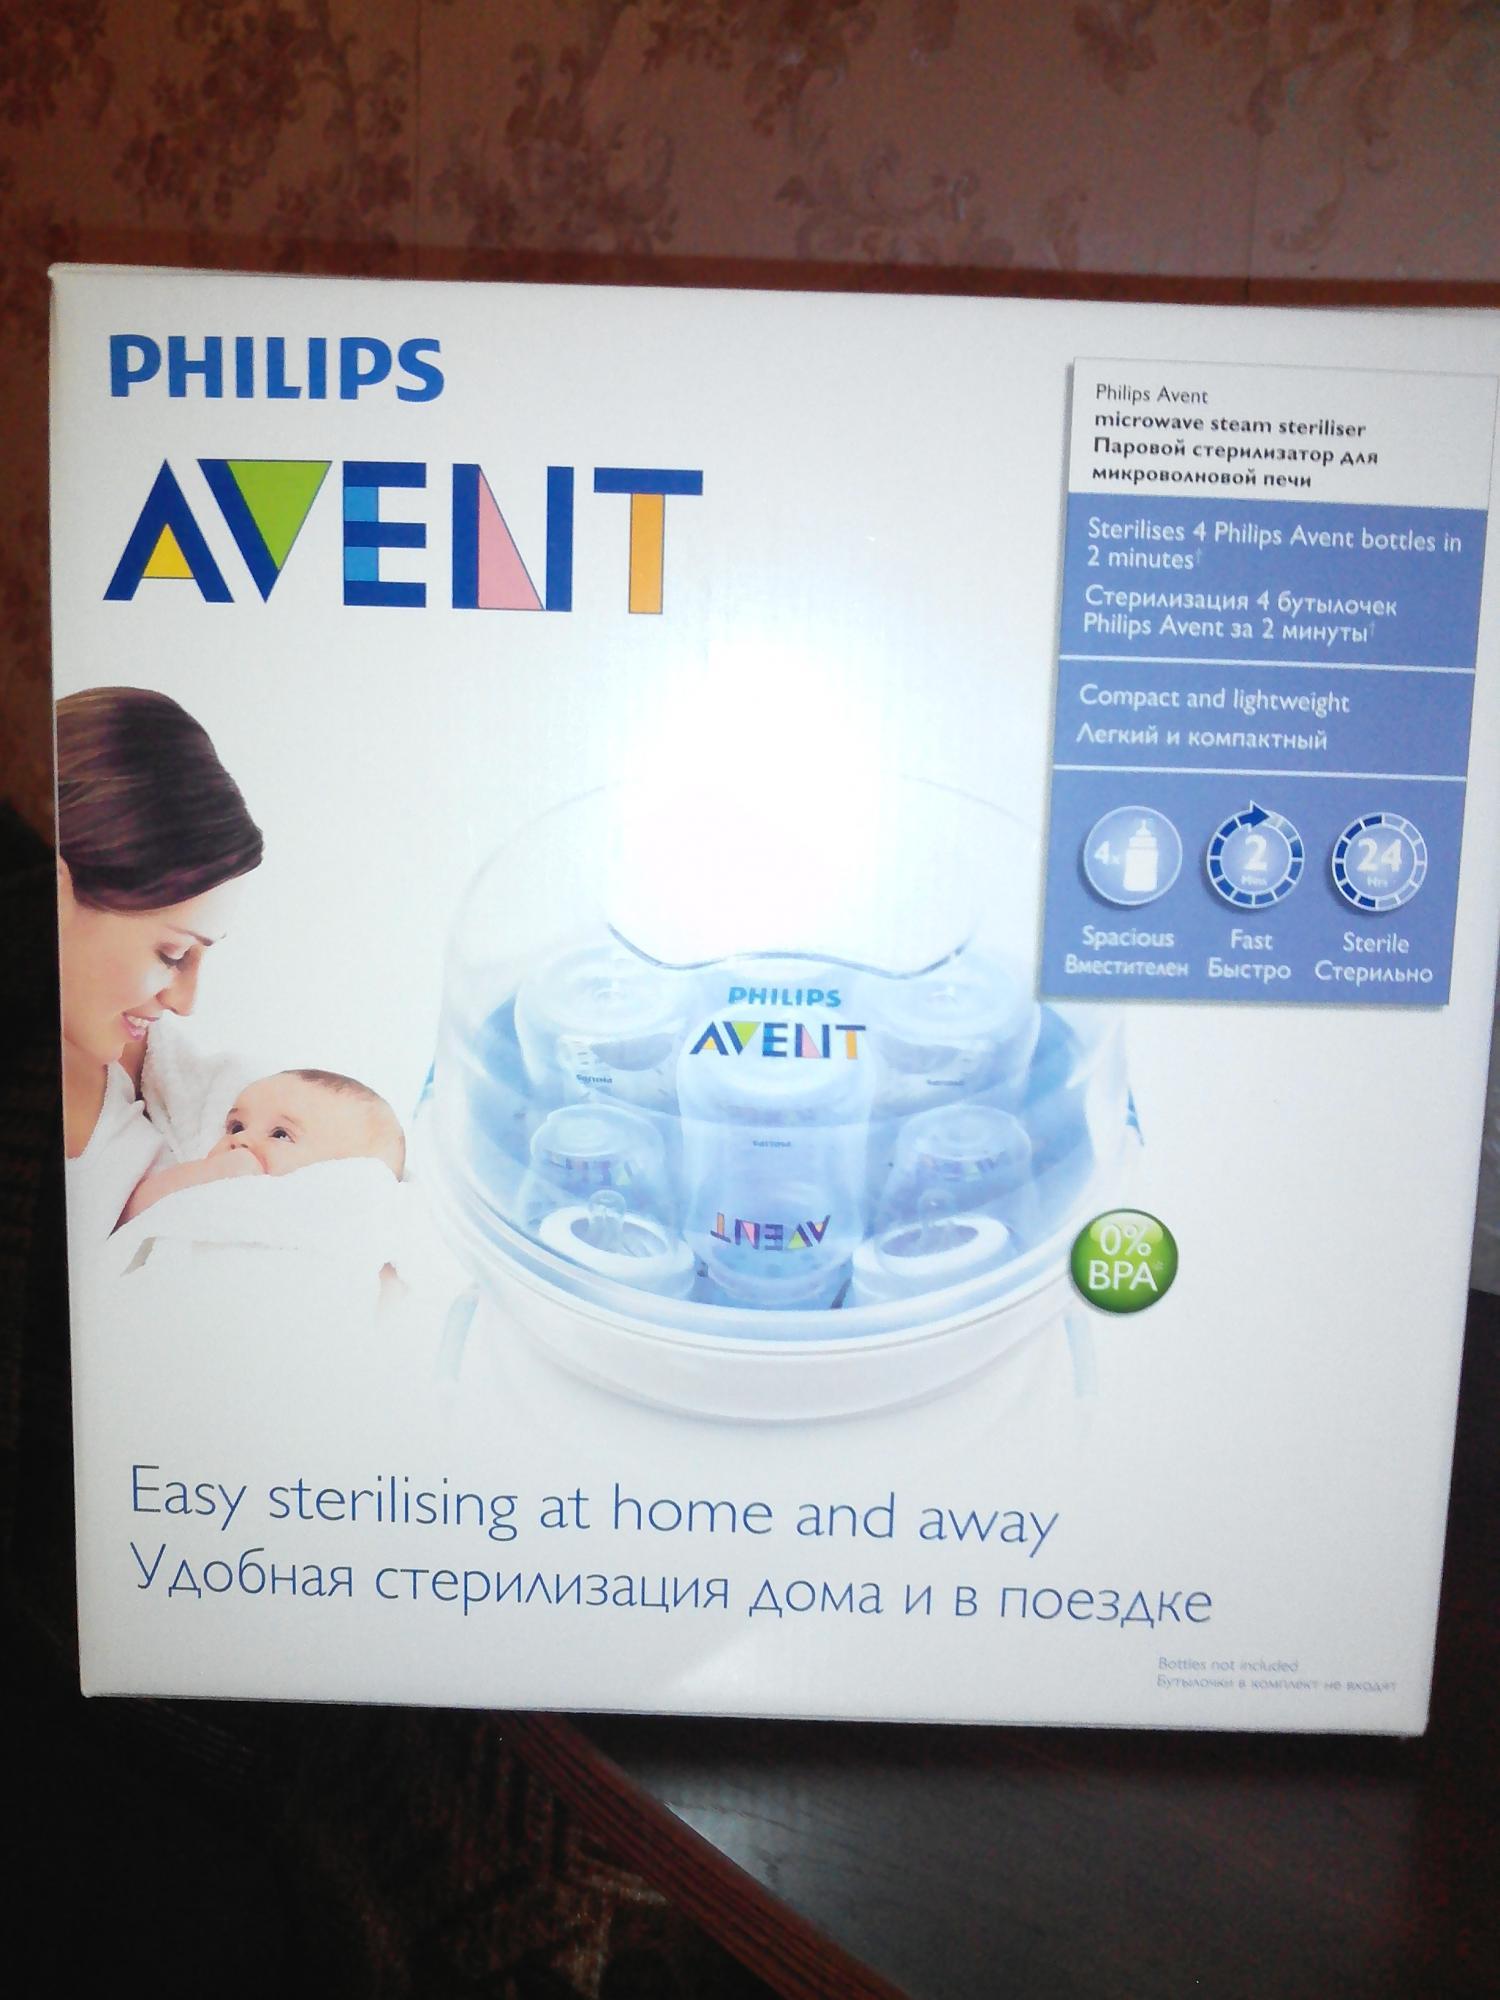 Sterilizer Philips AVENT buy 1